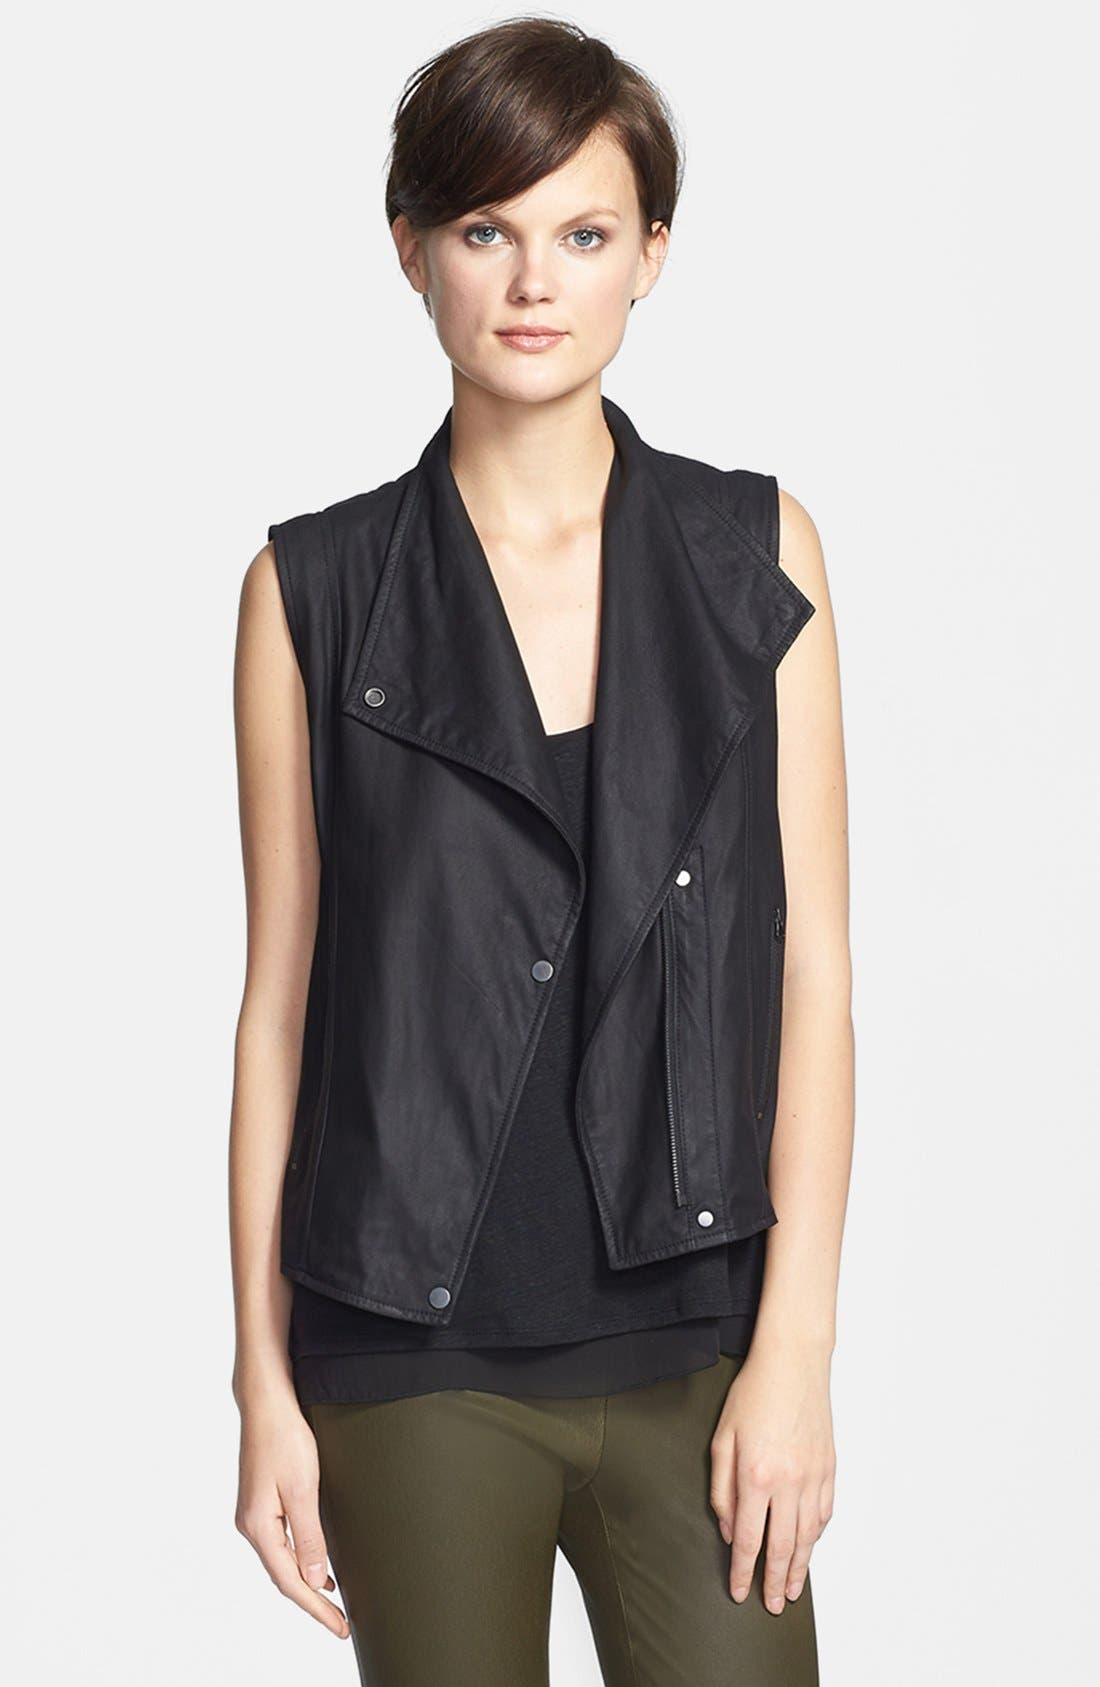 Alternate Image 1 Selected - Vince 'Paper' Leather Vest